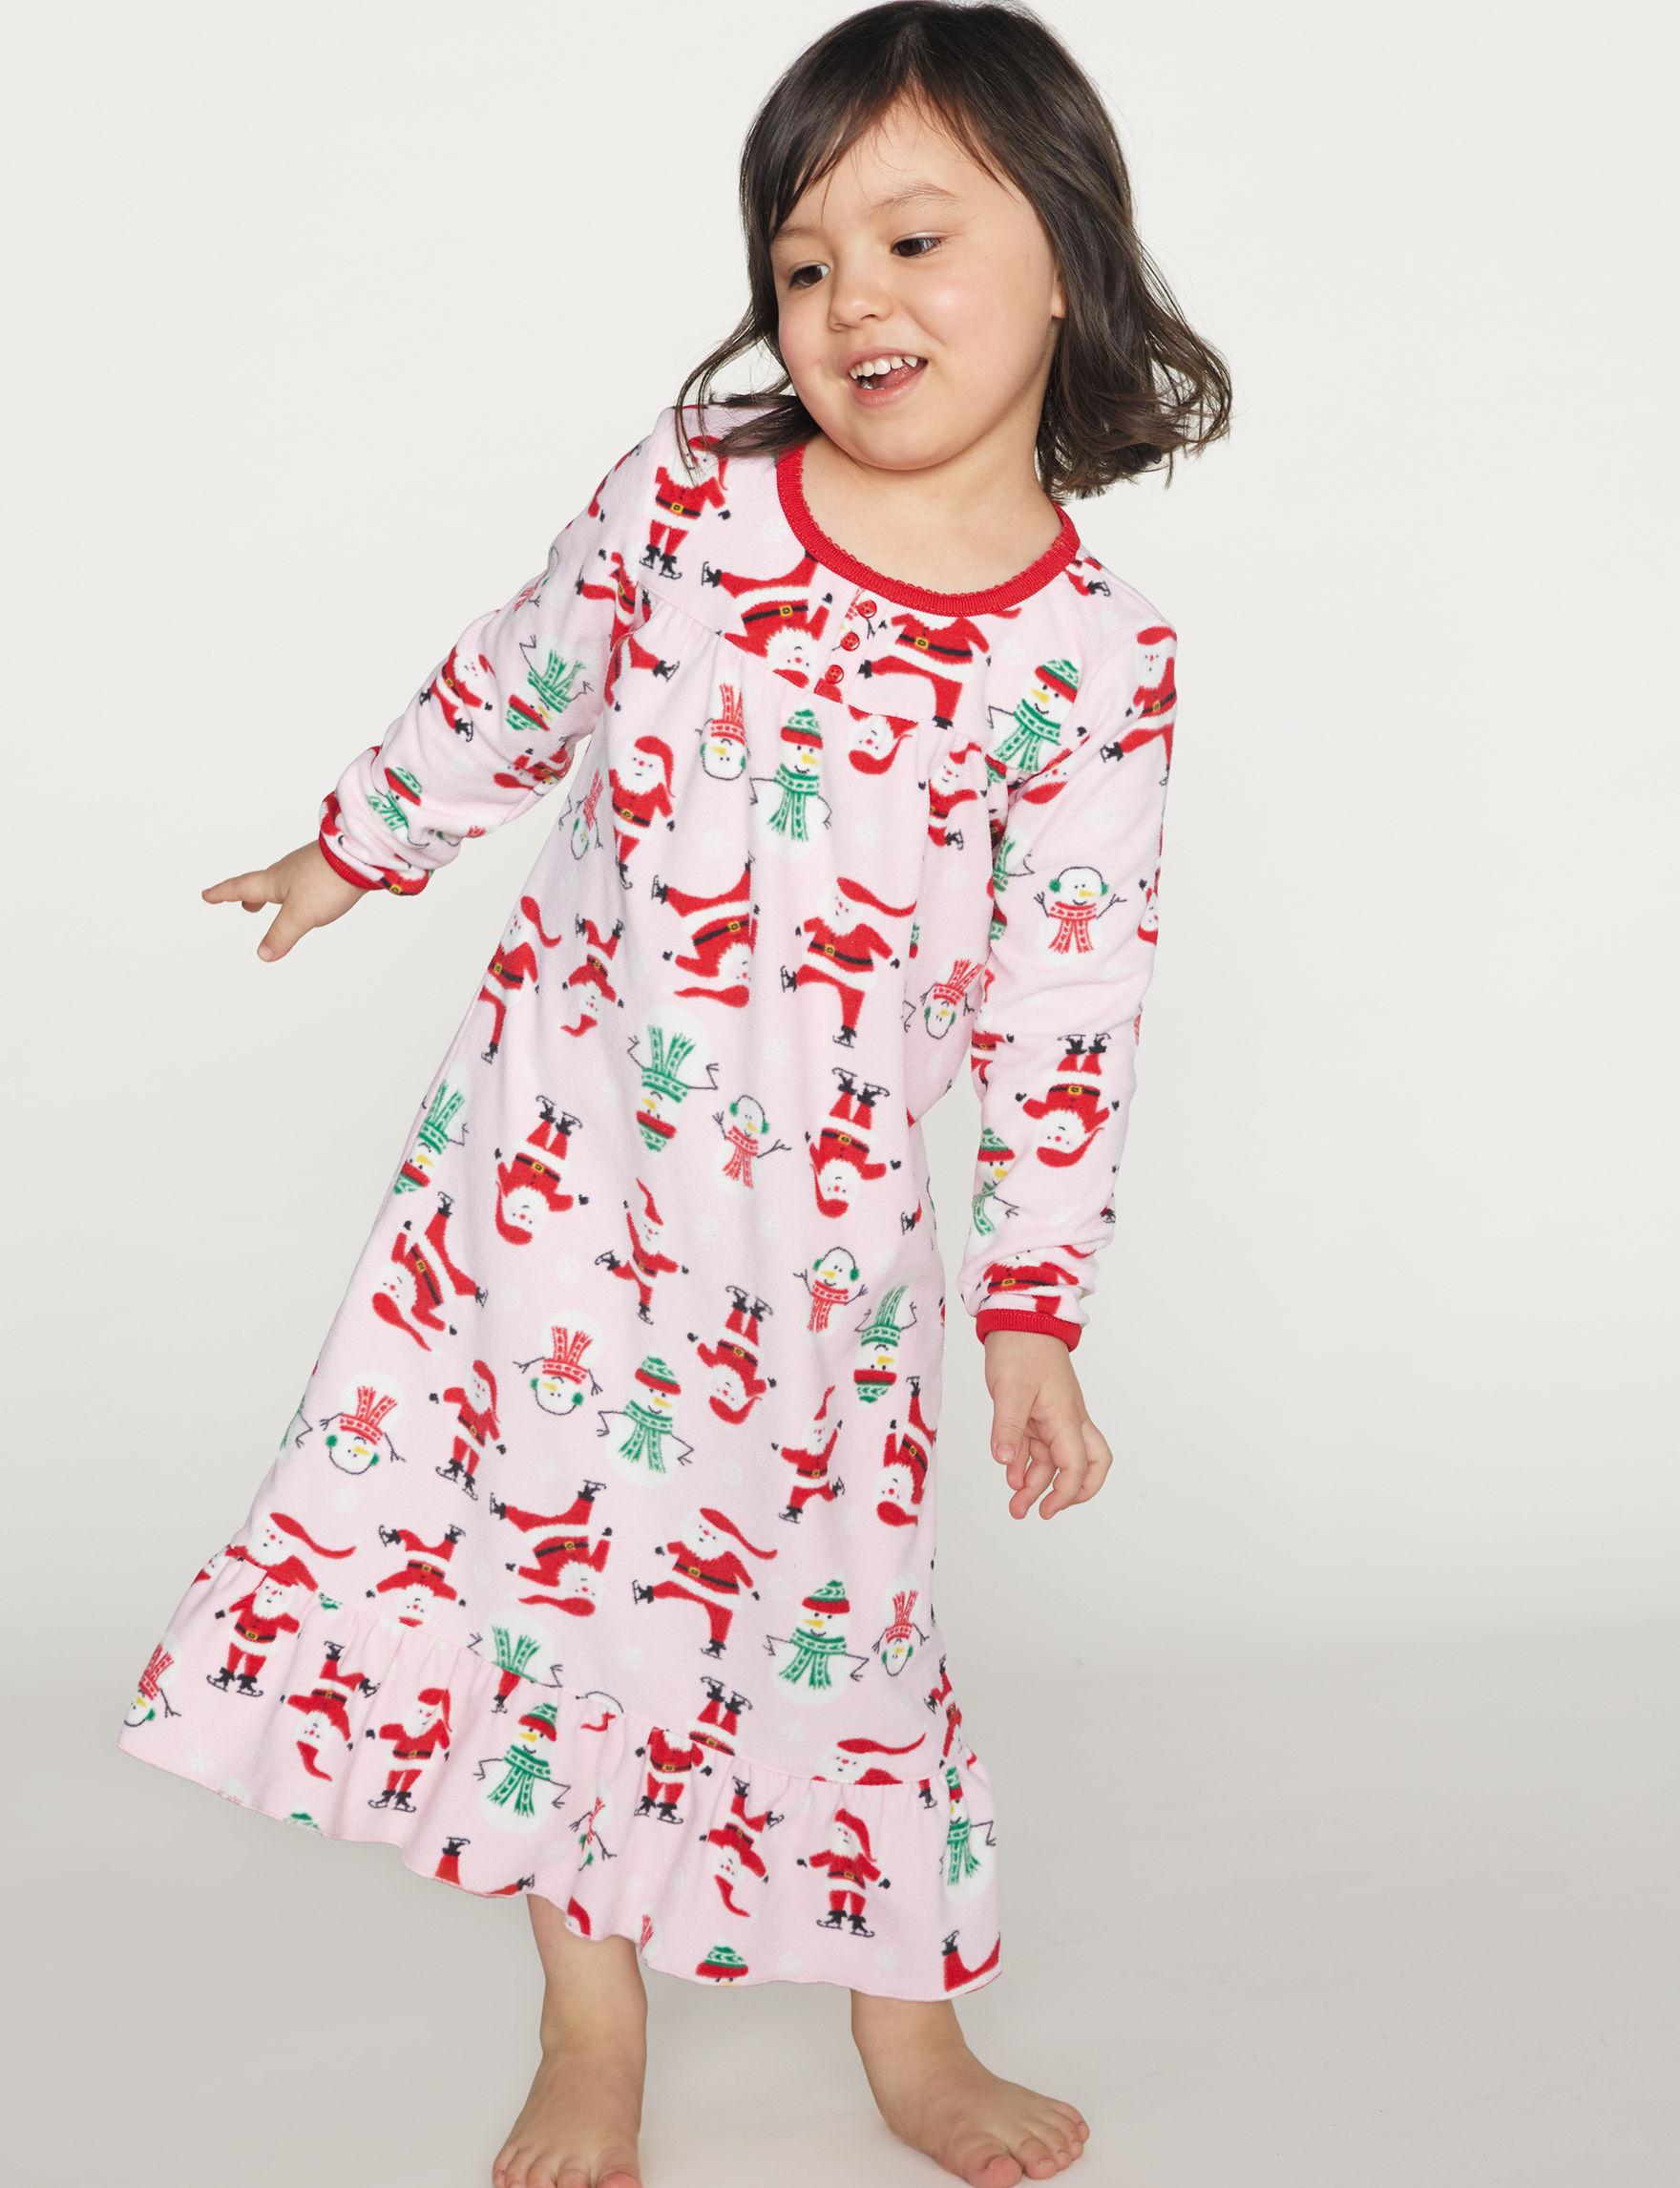 Carter's Print Nightgowns & Sleep Shirts